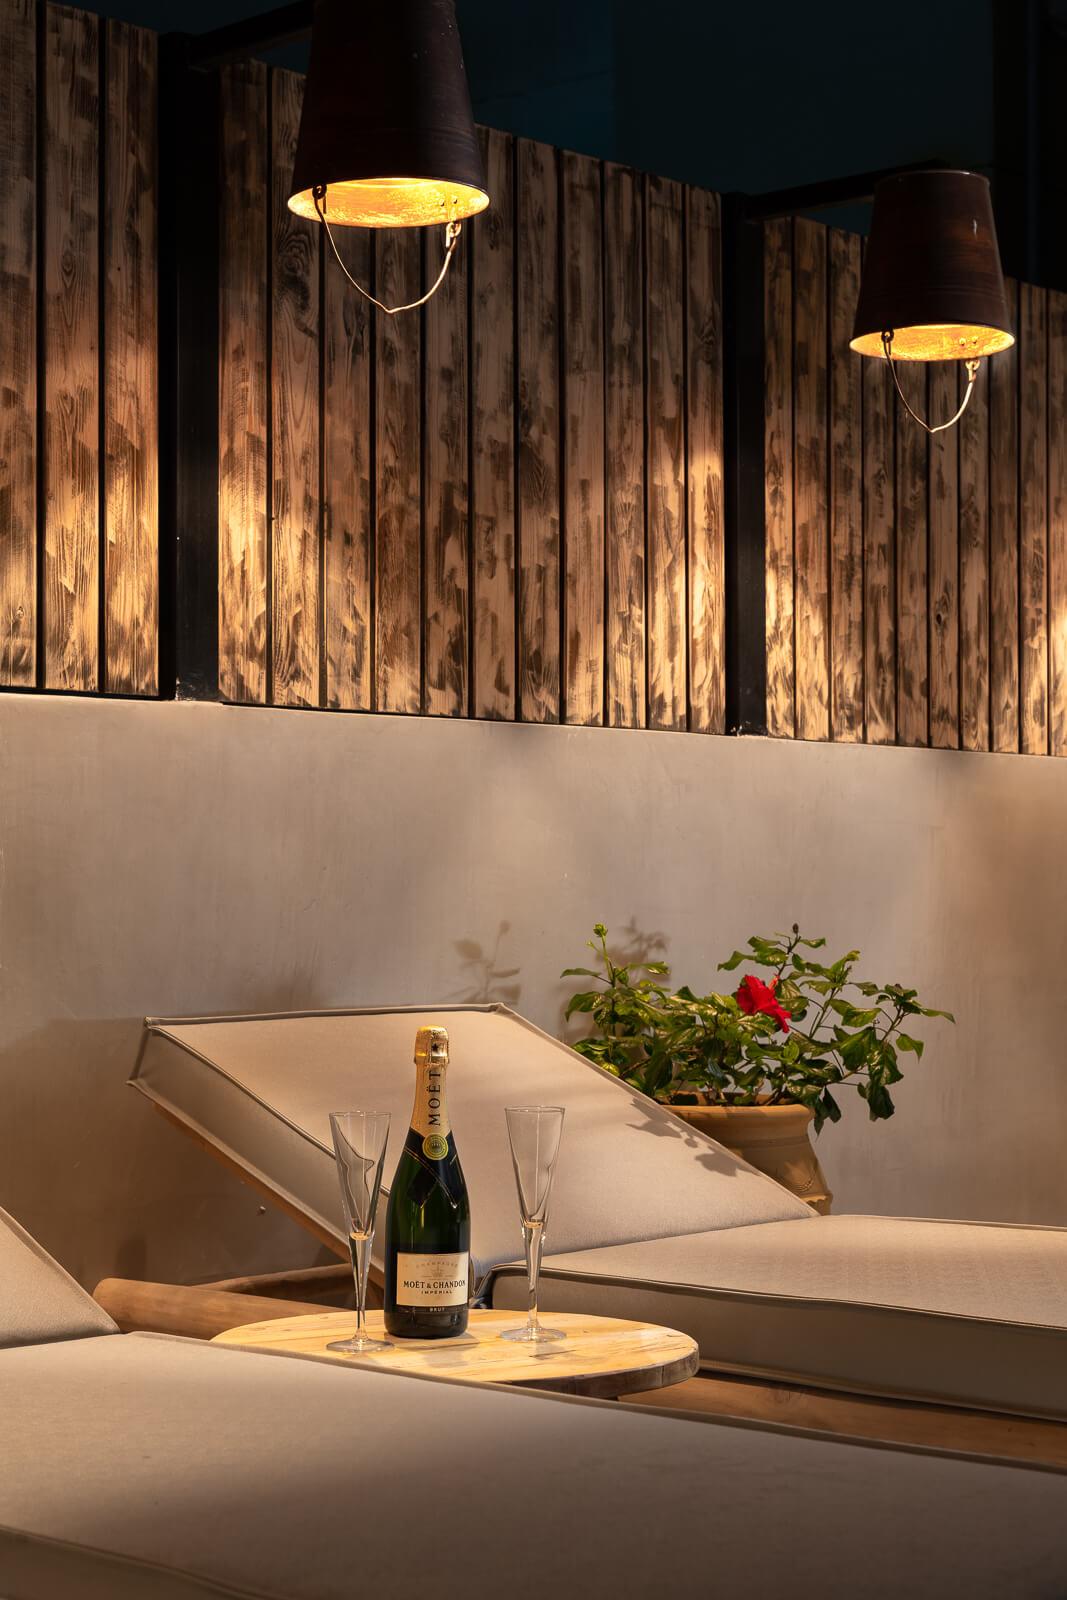 Iviskos Suite Private Terrace with Sunbeds - Elakati Hotel in Rhodes Greece